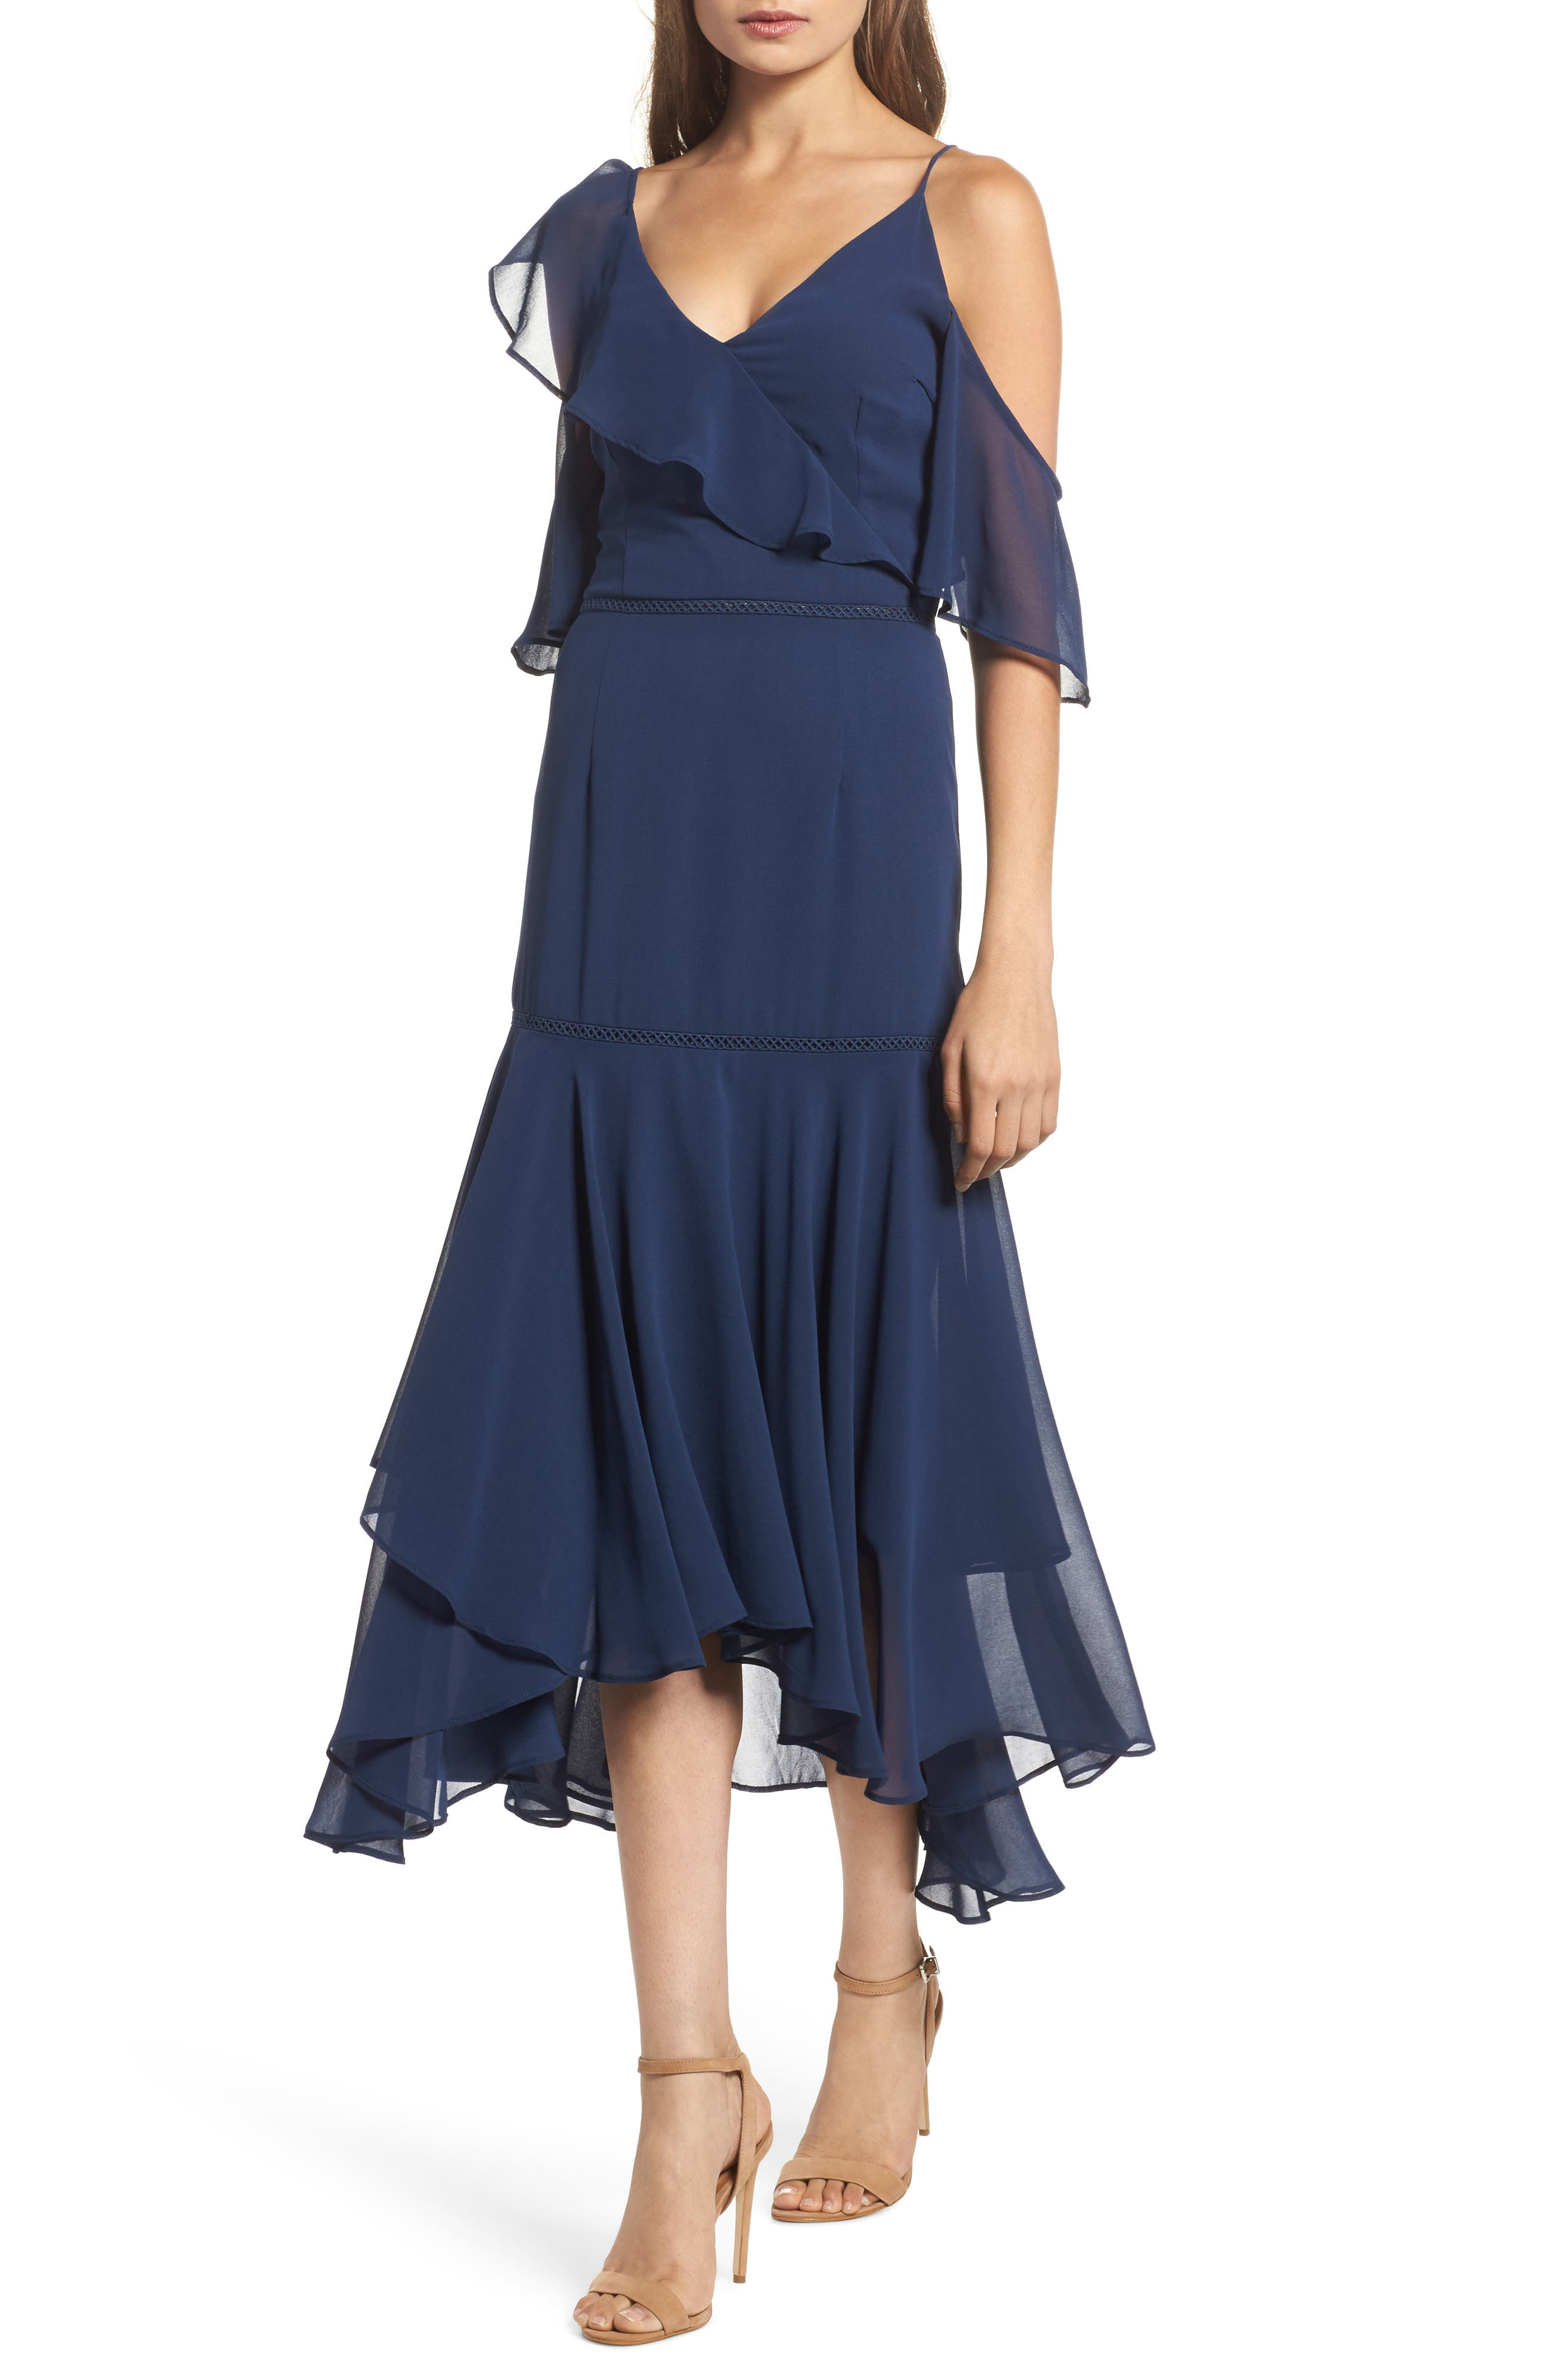 Utopia Cold Shoulder Midi Dress,                         Main,                         color, 435